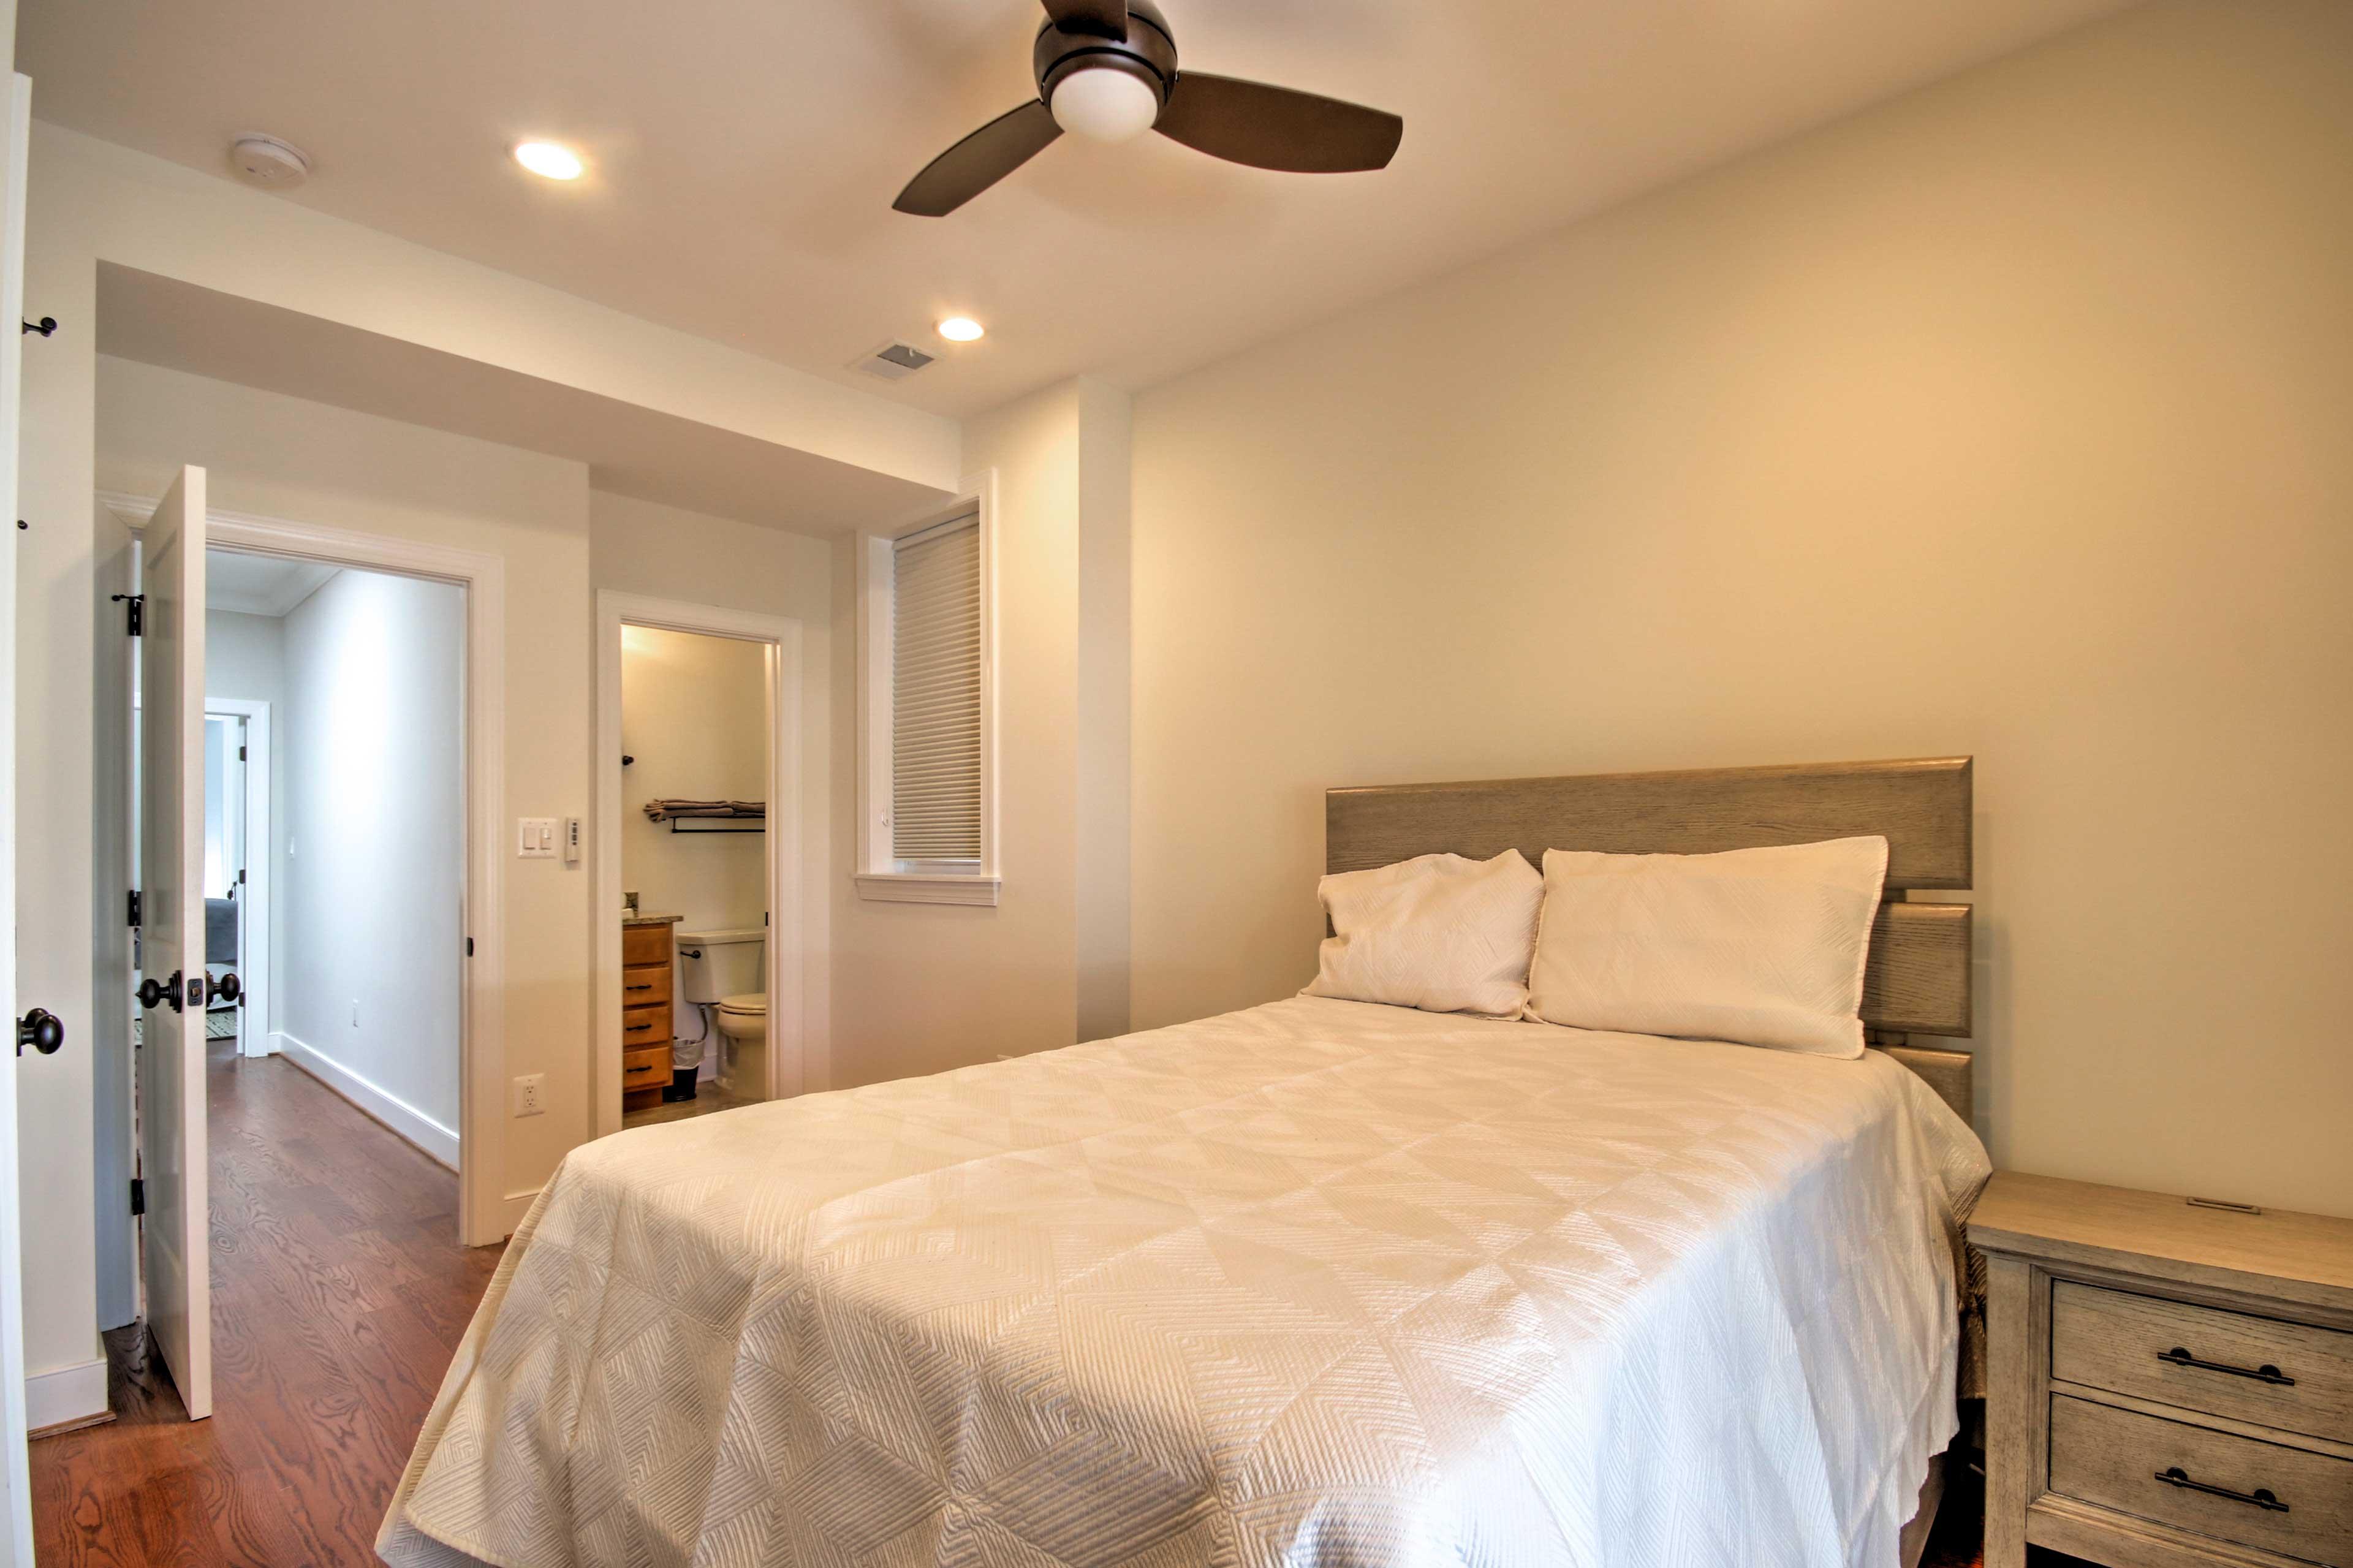 The second bedroom has a cozy full mattress.